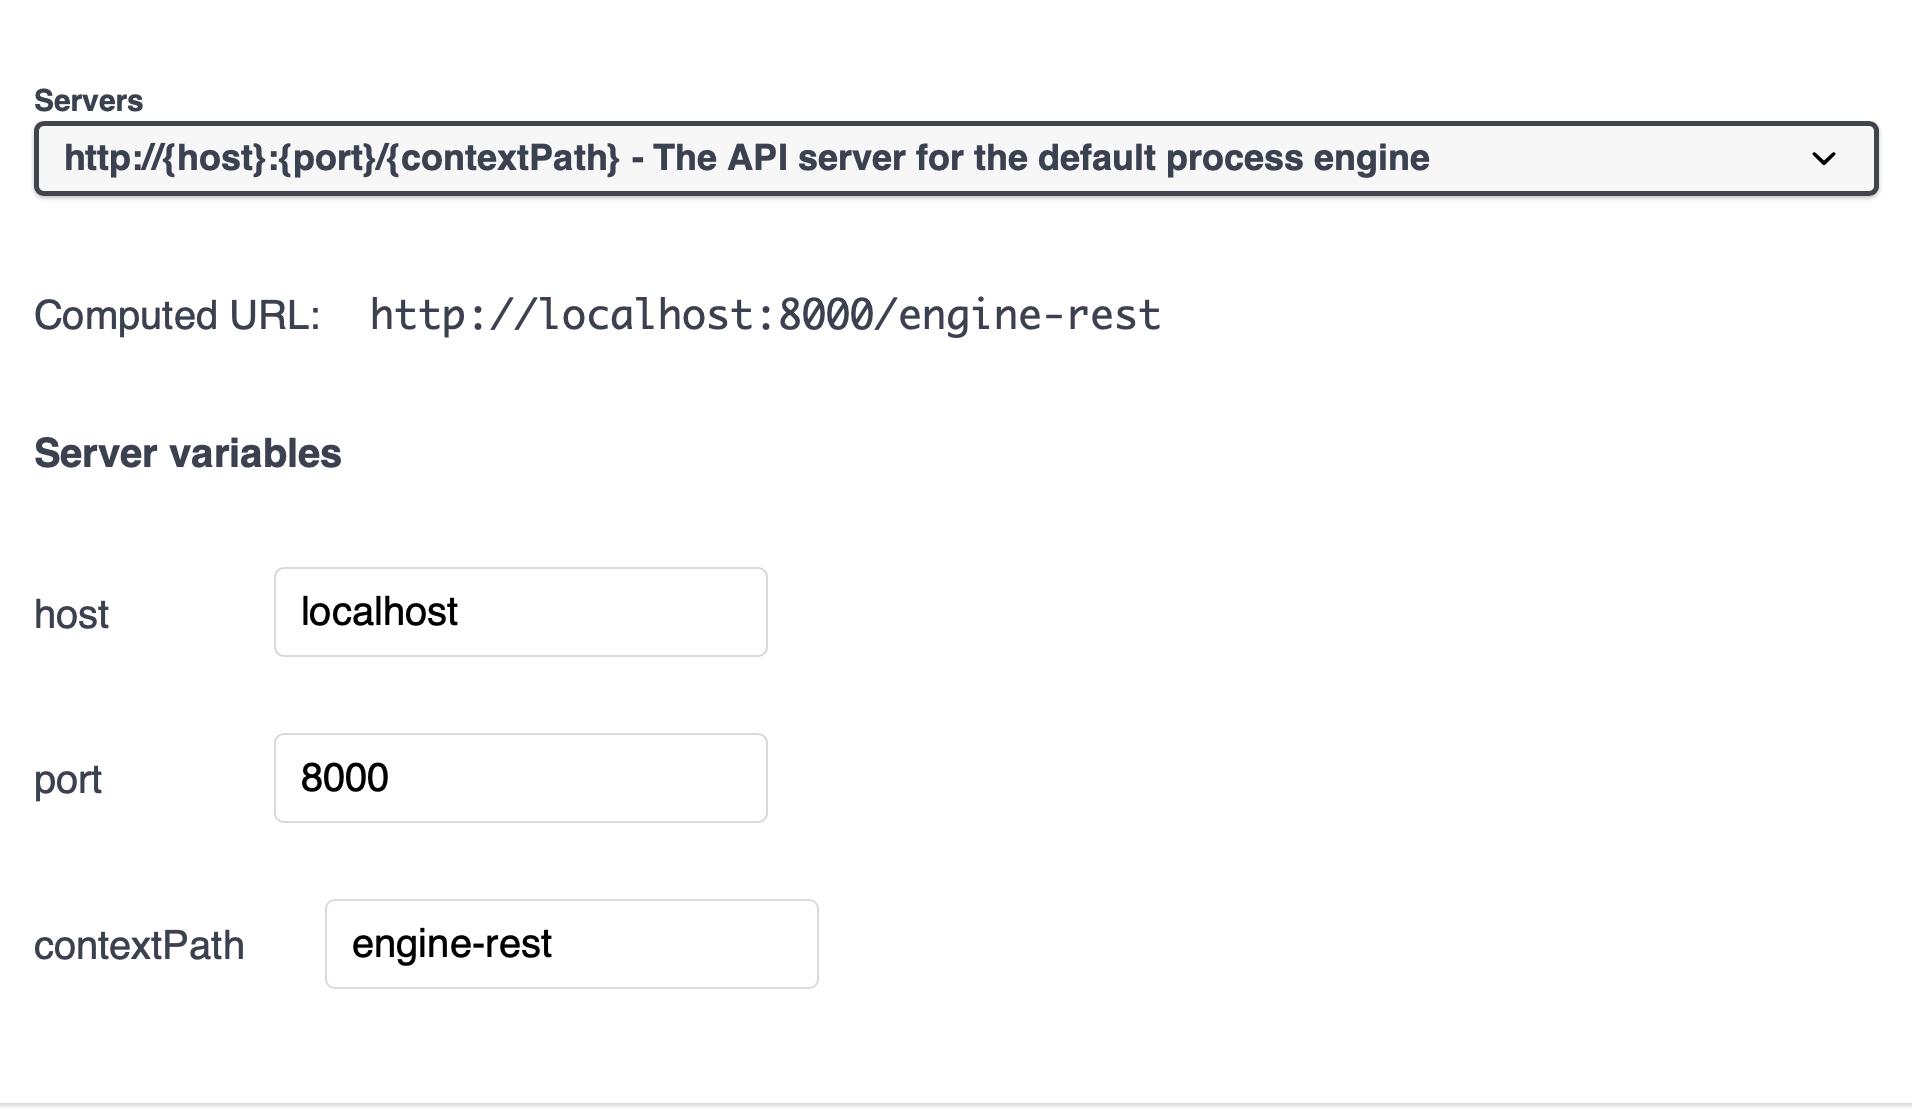 Screenshot showing using port 8000